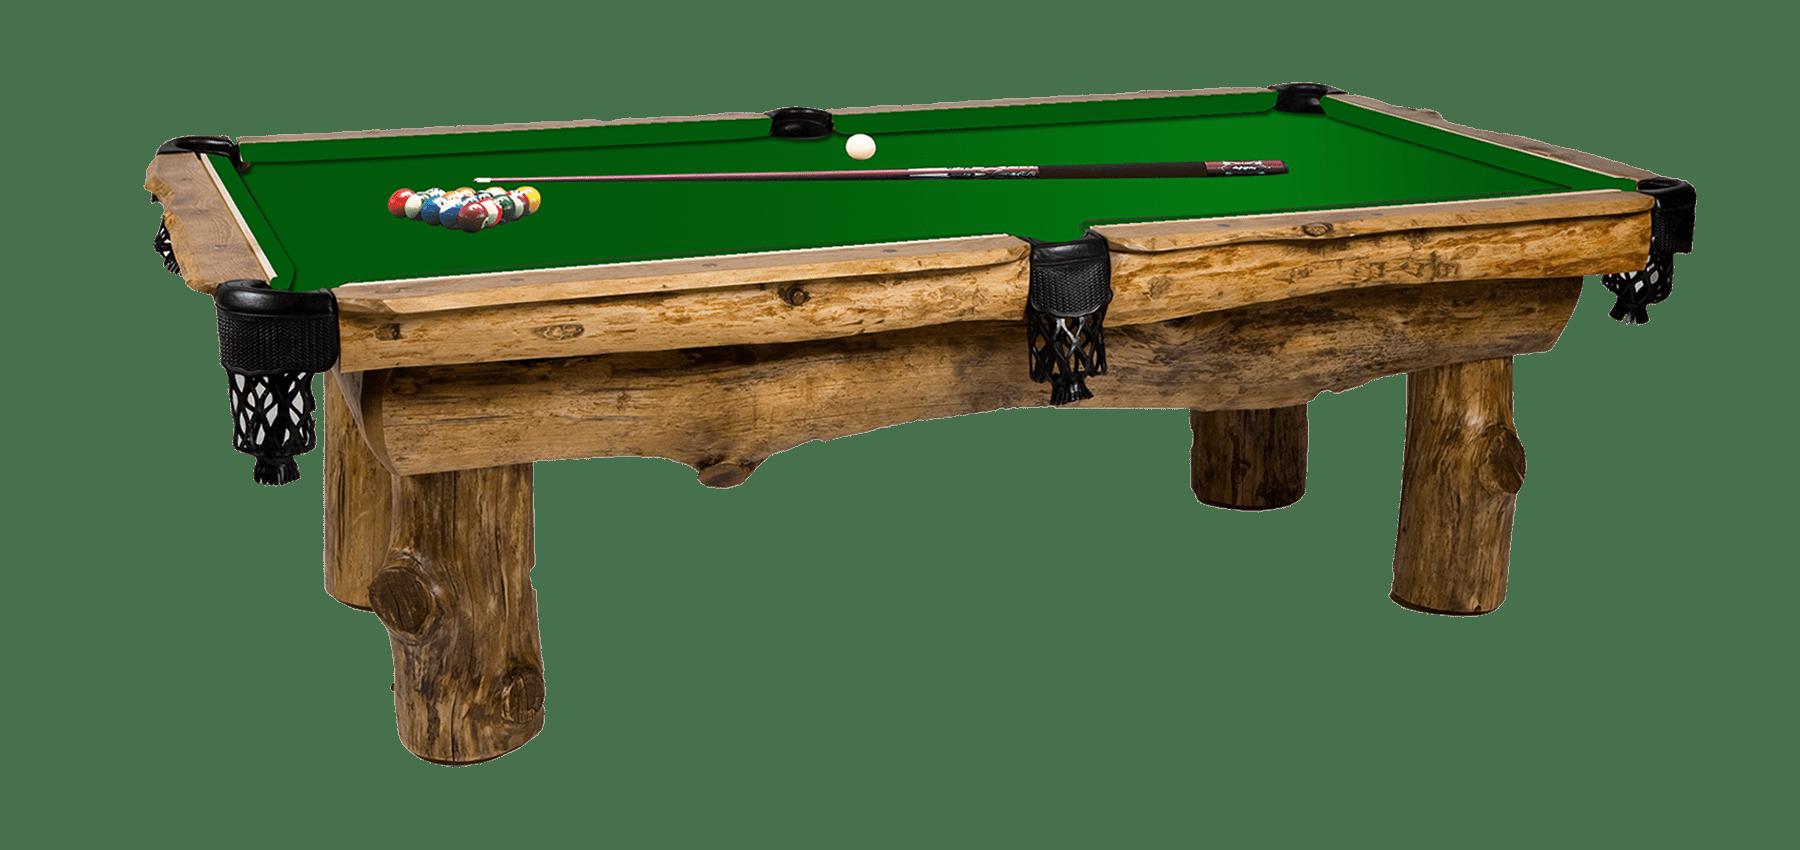 Pool Table Sale Olhausen Billiard Tables Reno Lake Tahoe Sparks - Olhausen madison pool table